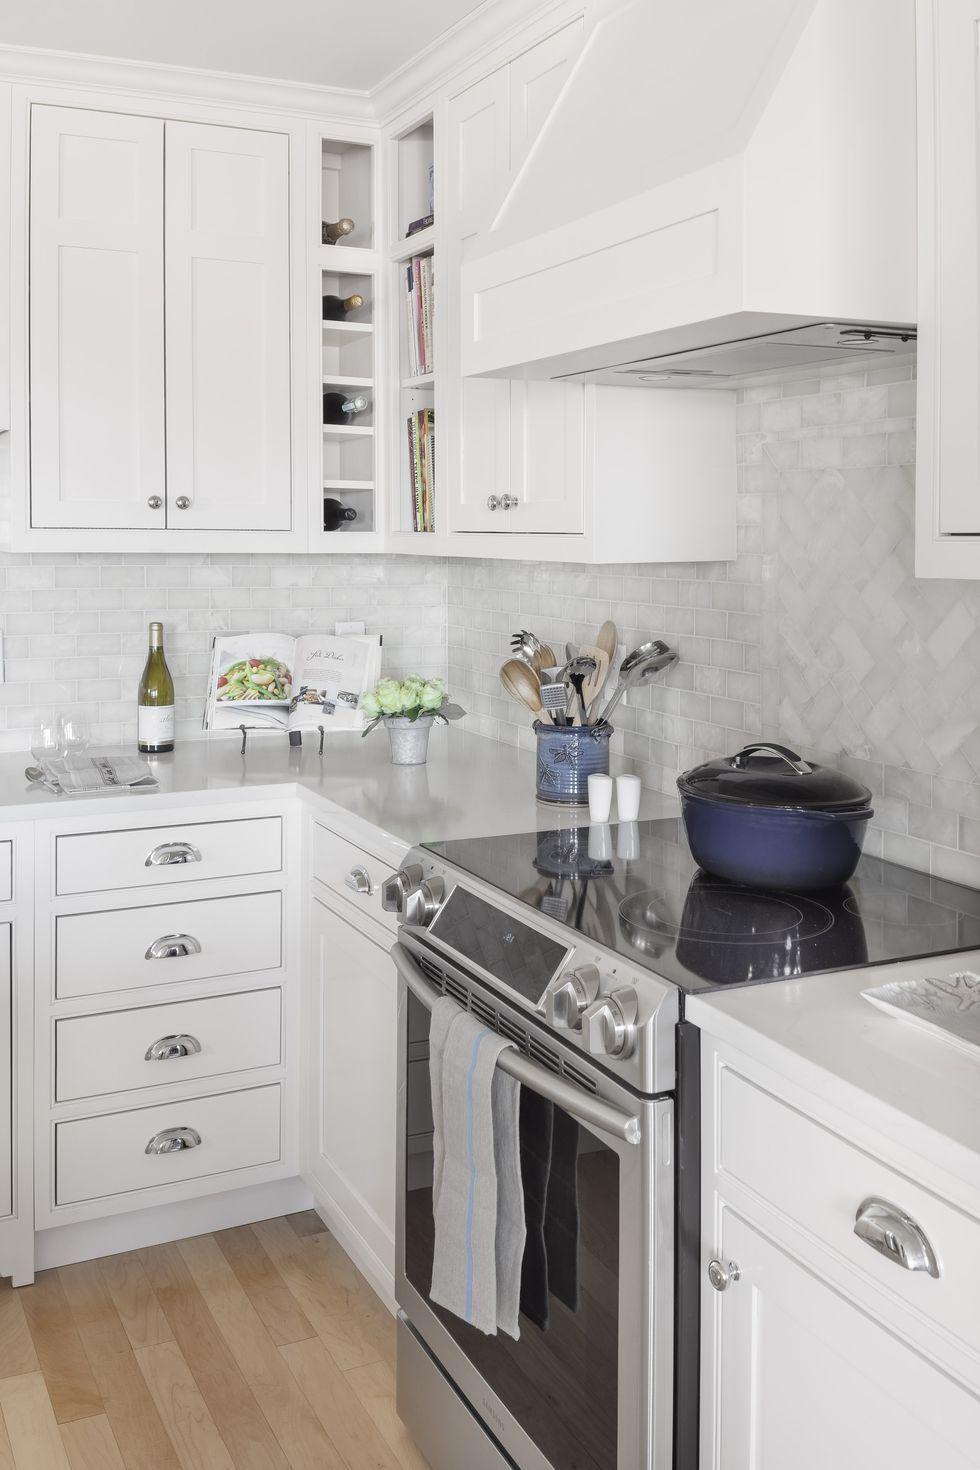 26 kitchen tile backsplash ideas to show off your style white modern kitchen stylish kitchen on kitchen ideas white id=18734